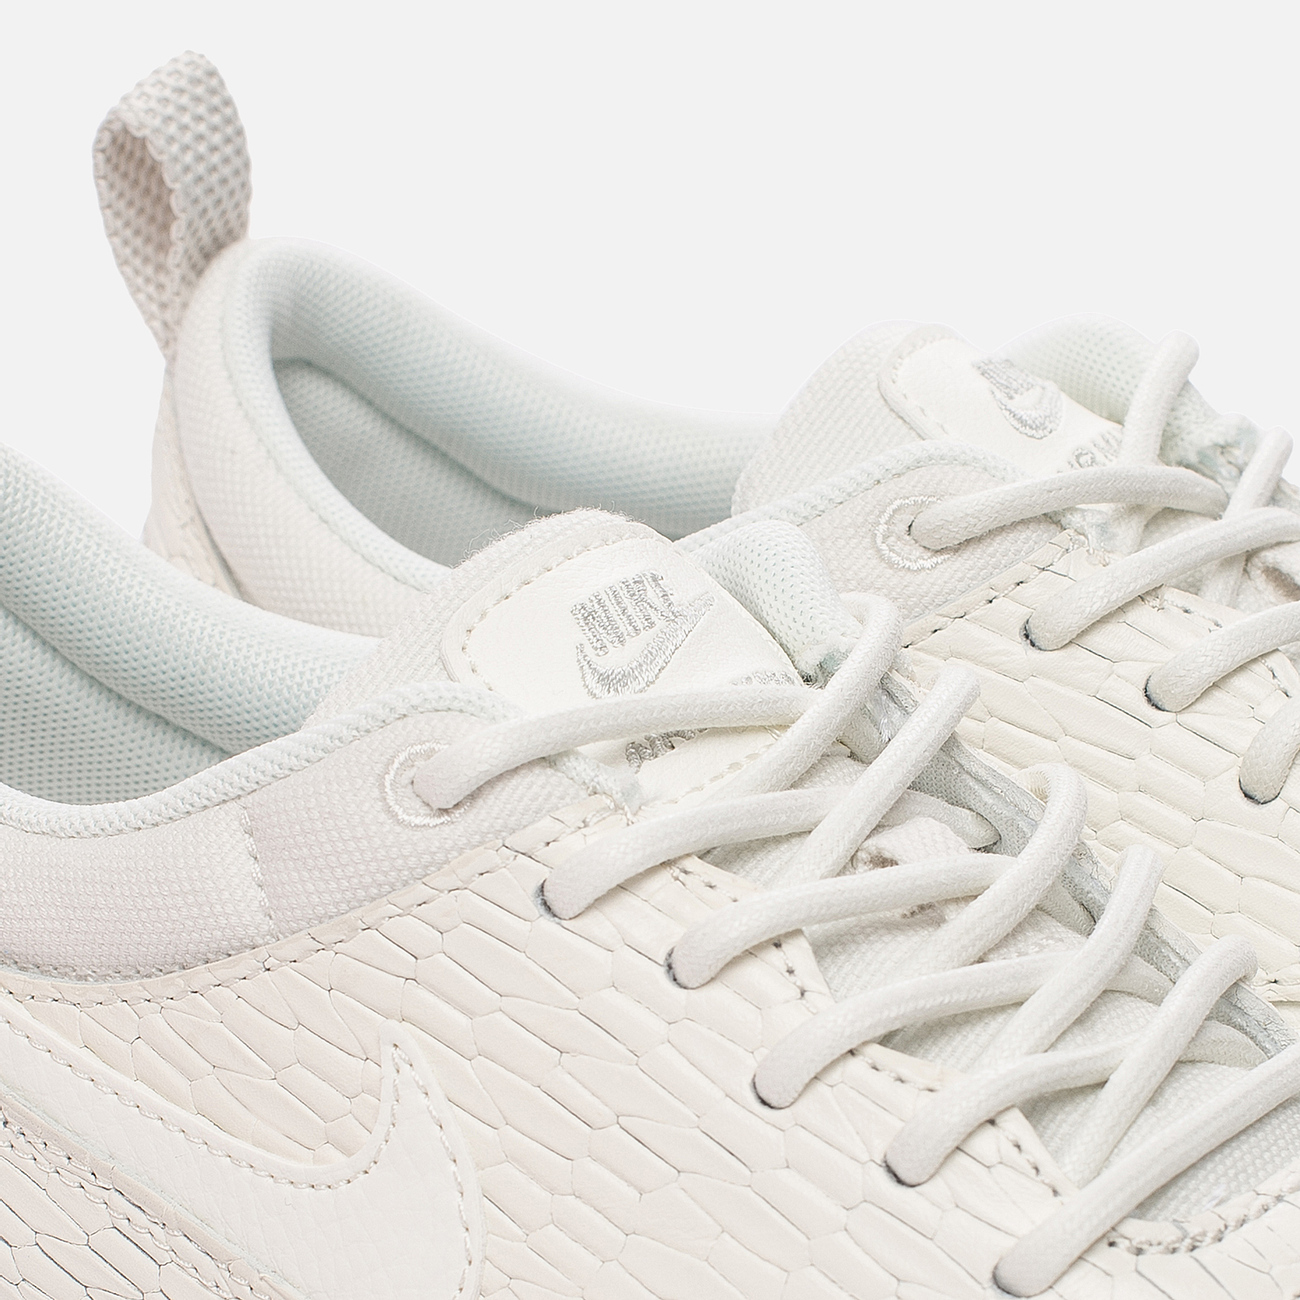 Женские кроссовки Nike Air Max Thea Premium Leather 904500 100